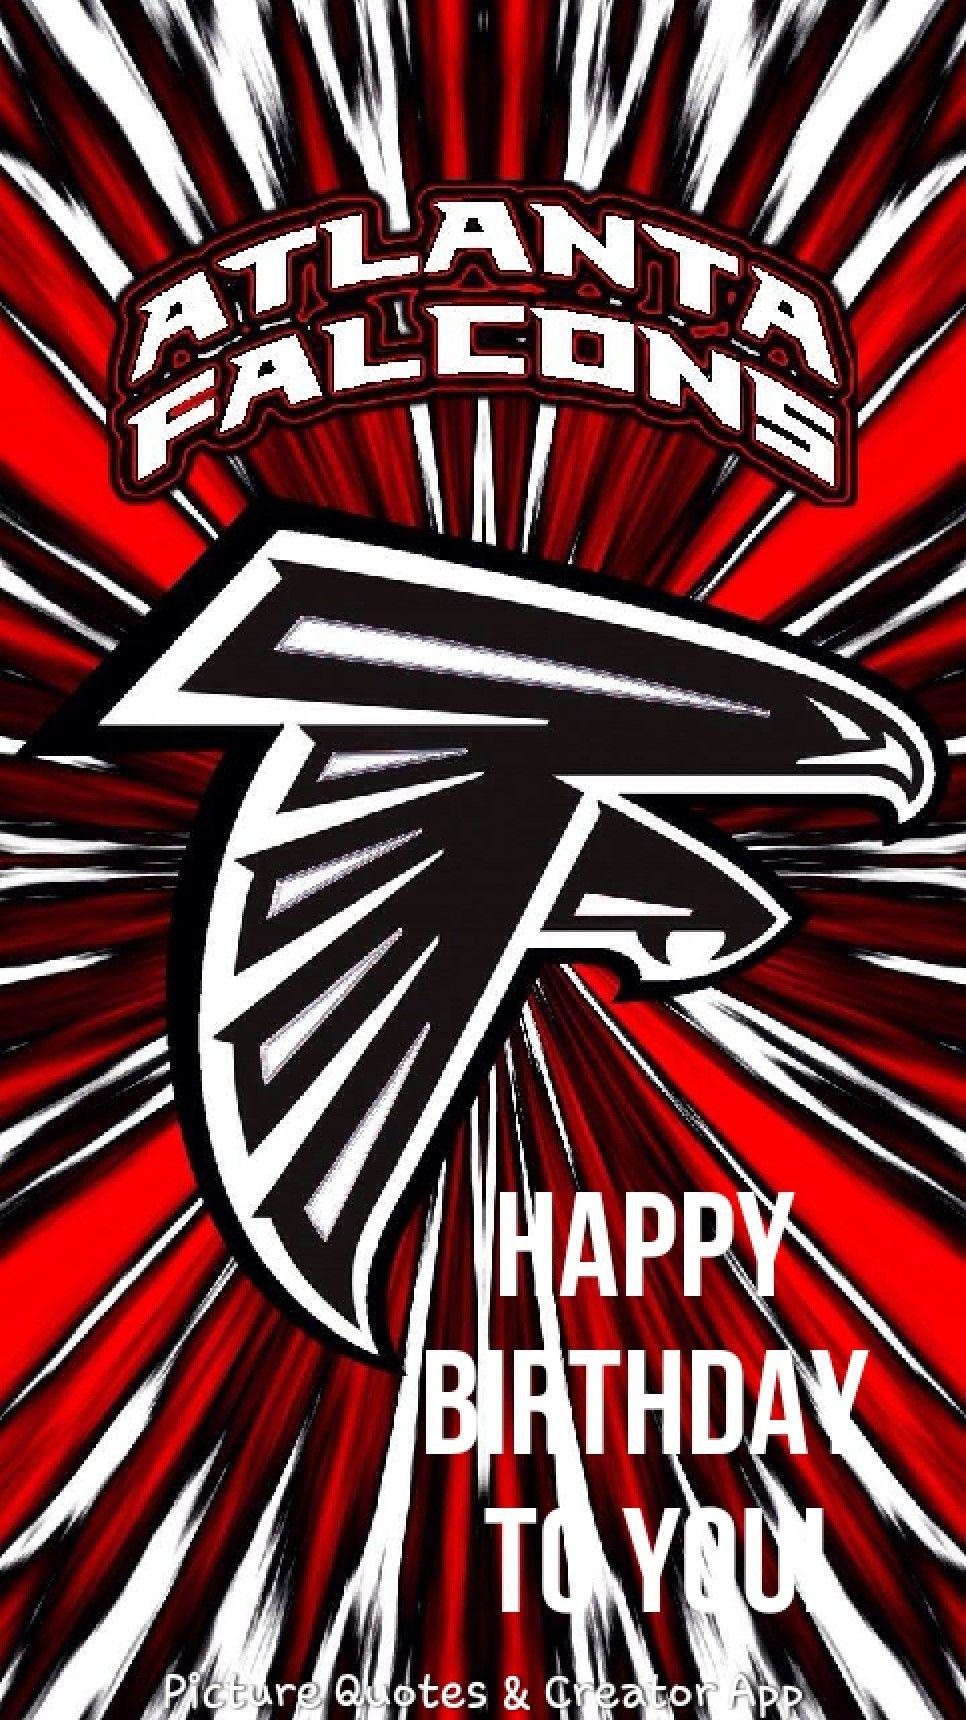 Pin By Tam Tam On Football Team Cakes Bd Wishes Atlanta Falcons Football Atlanta Falcons Art Atlanta Falcons Logo